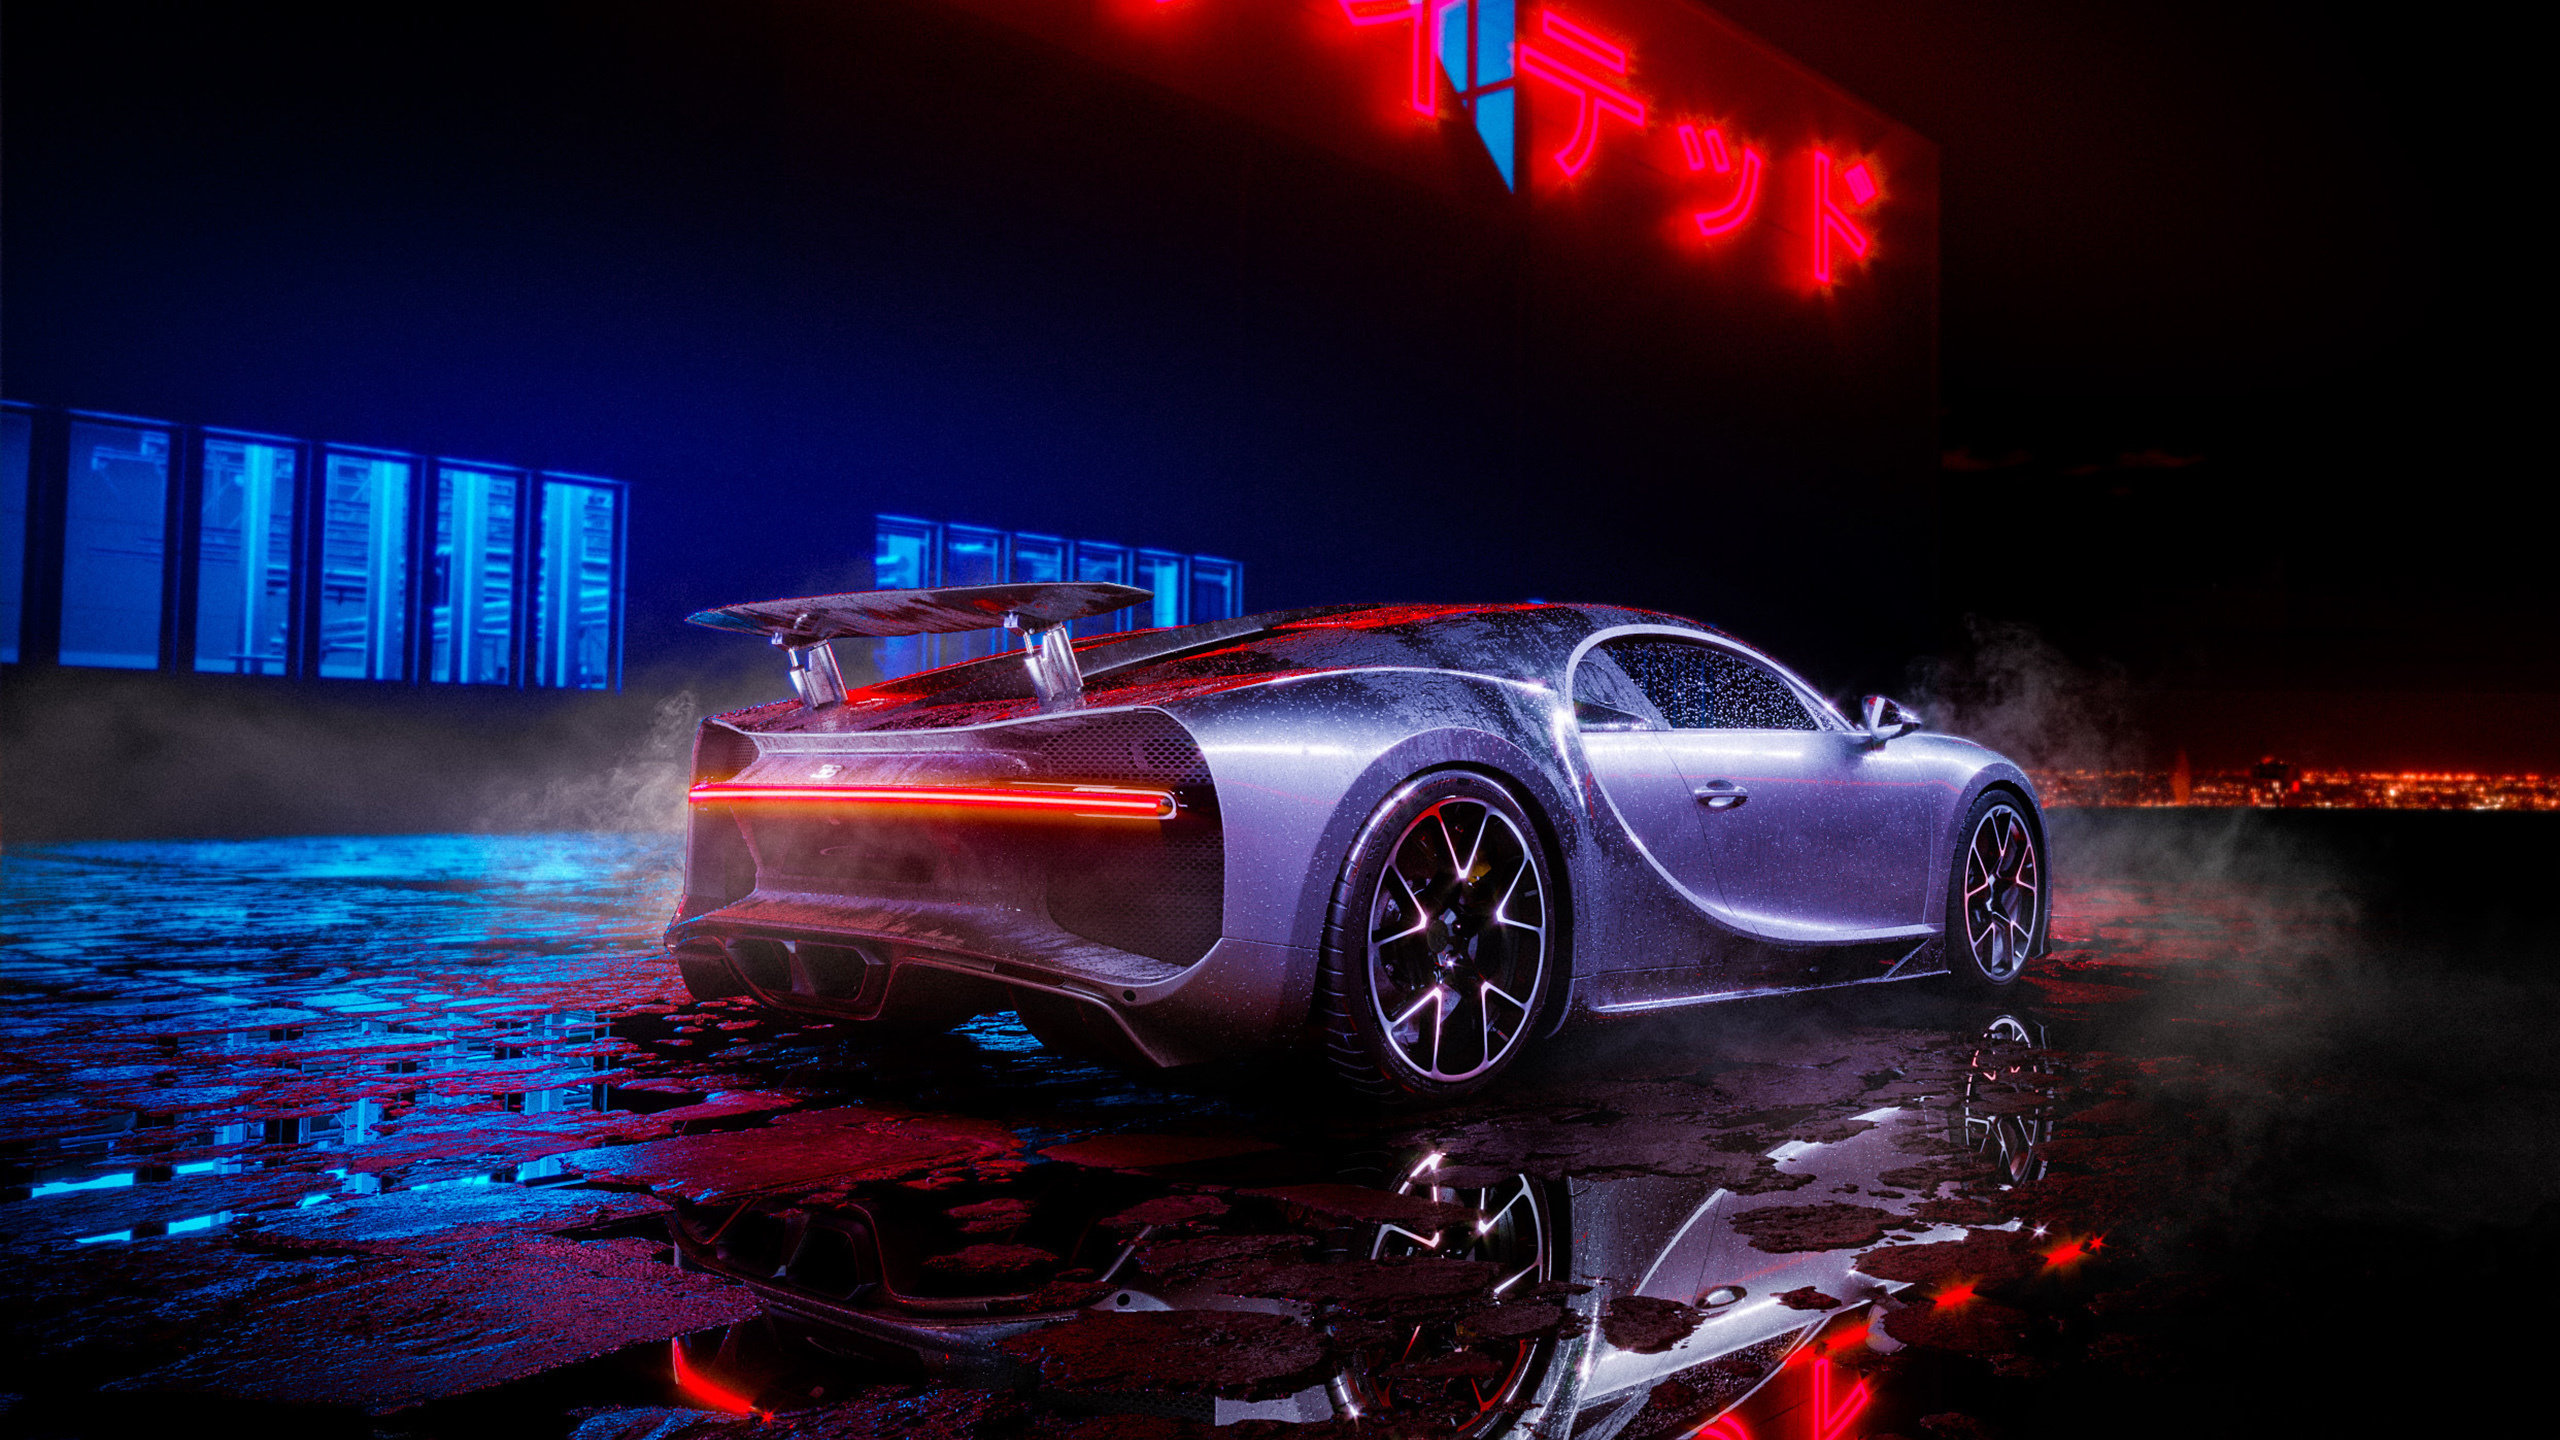 Download 2560x1440 Wallpaper Bugatti Chiron Neon Lights Luxury Car Dual Wide Widescreen 16 9 Widescreen 2560x1440 Hd Image Background 15035